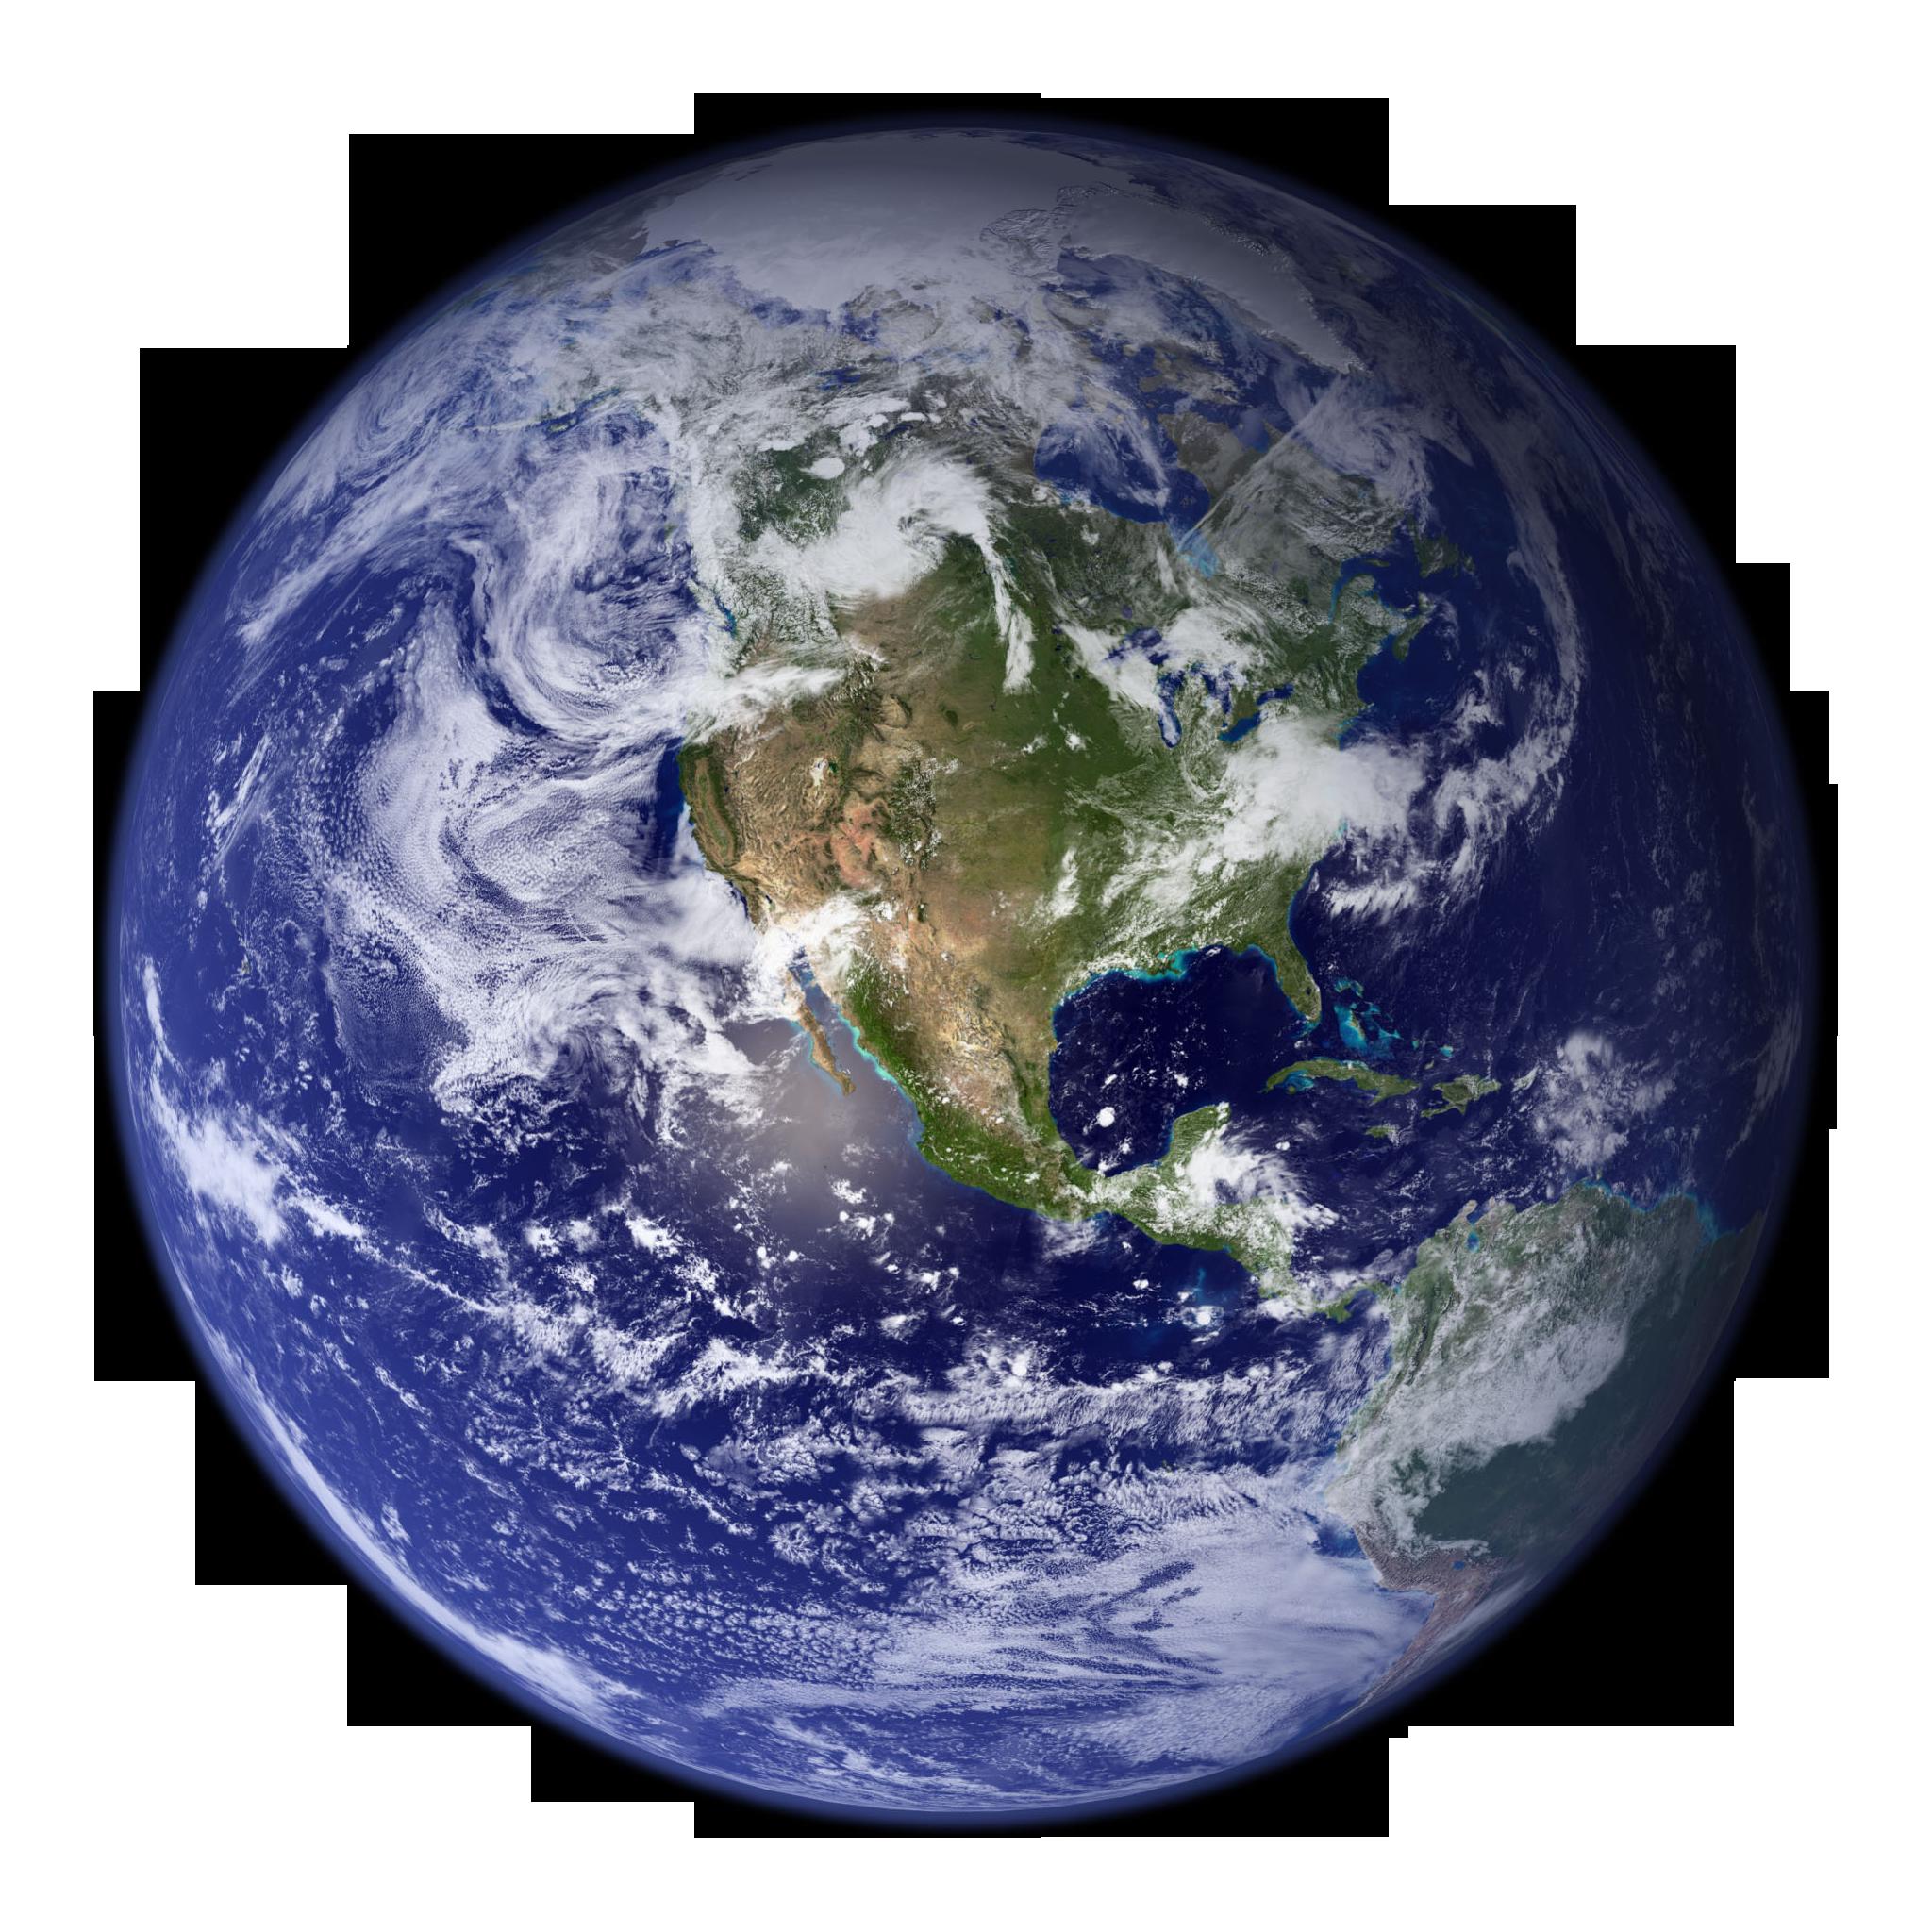 File:Earth Western Hemisphere transparent background.png.